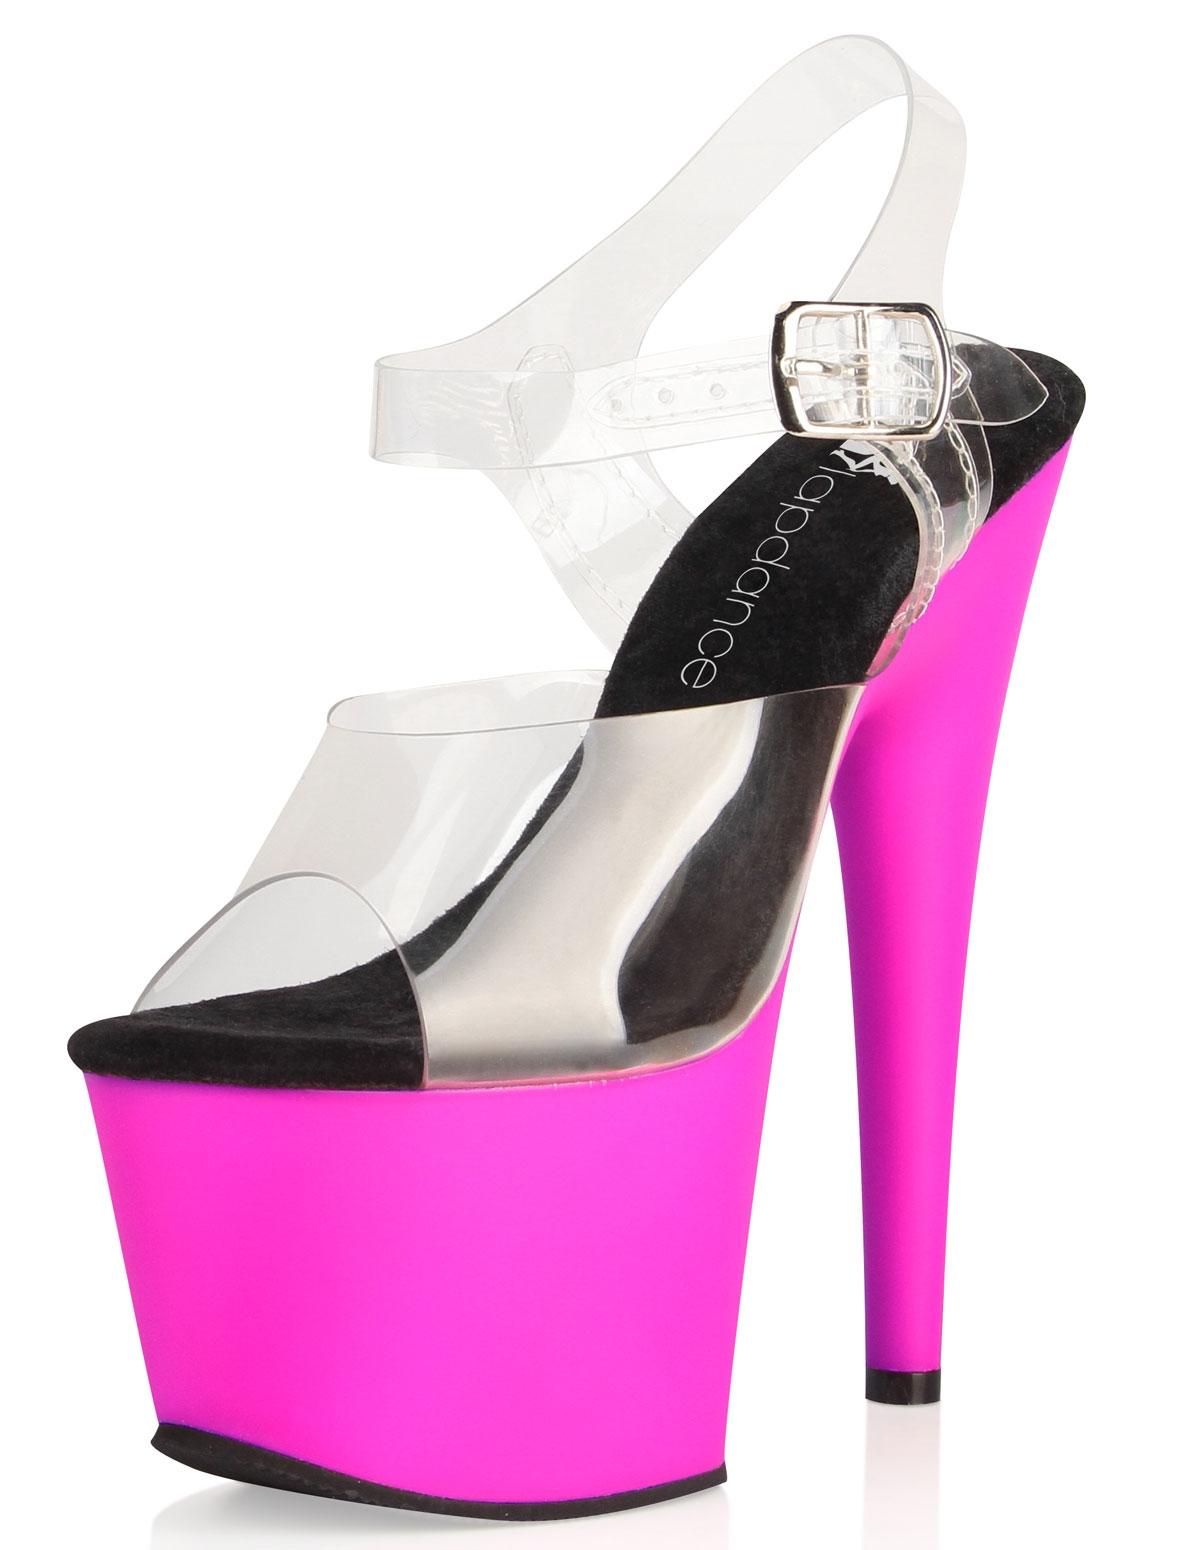 7 Inch Clear & Pink Platform Shoe